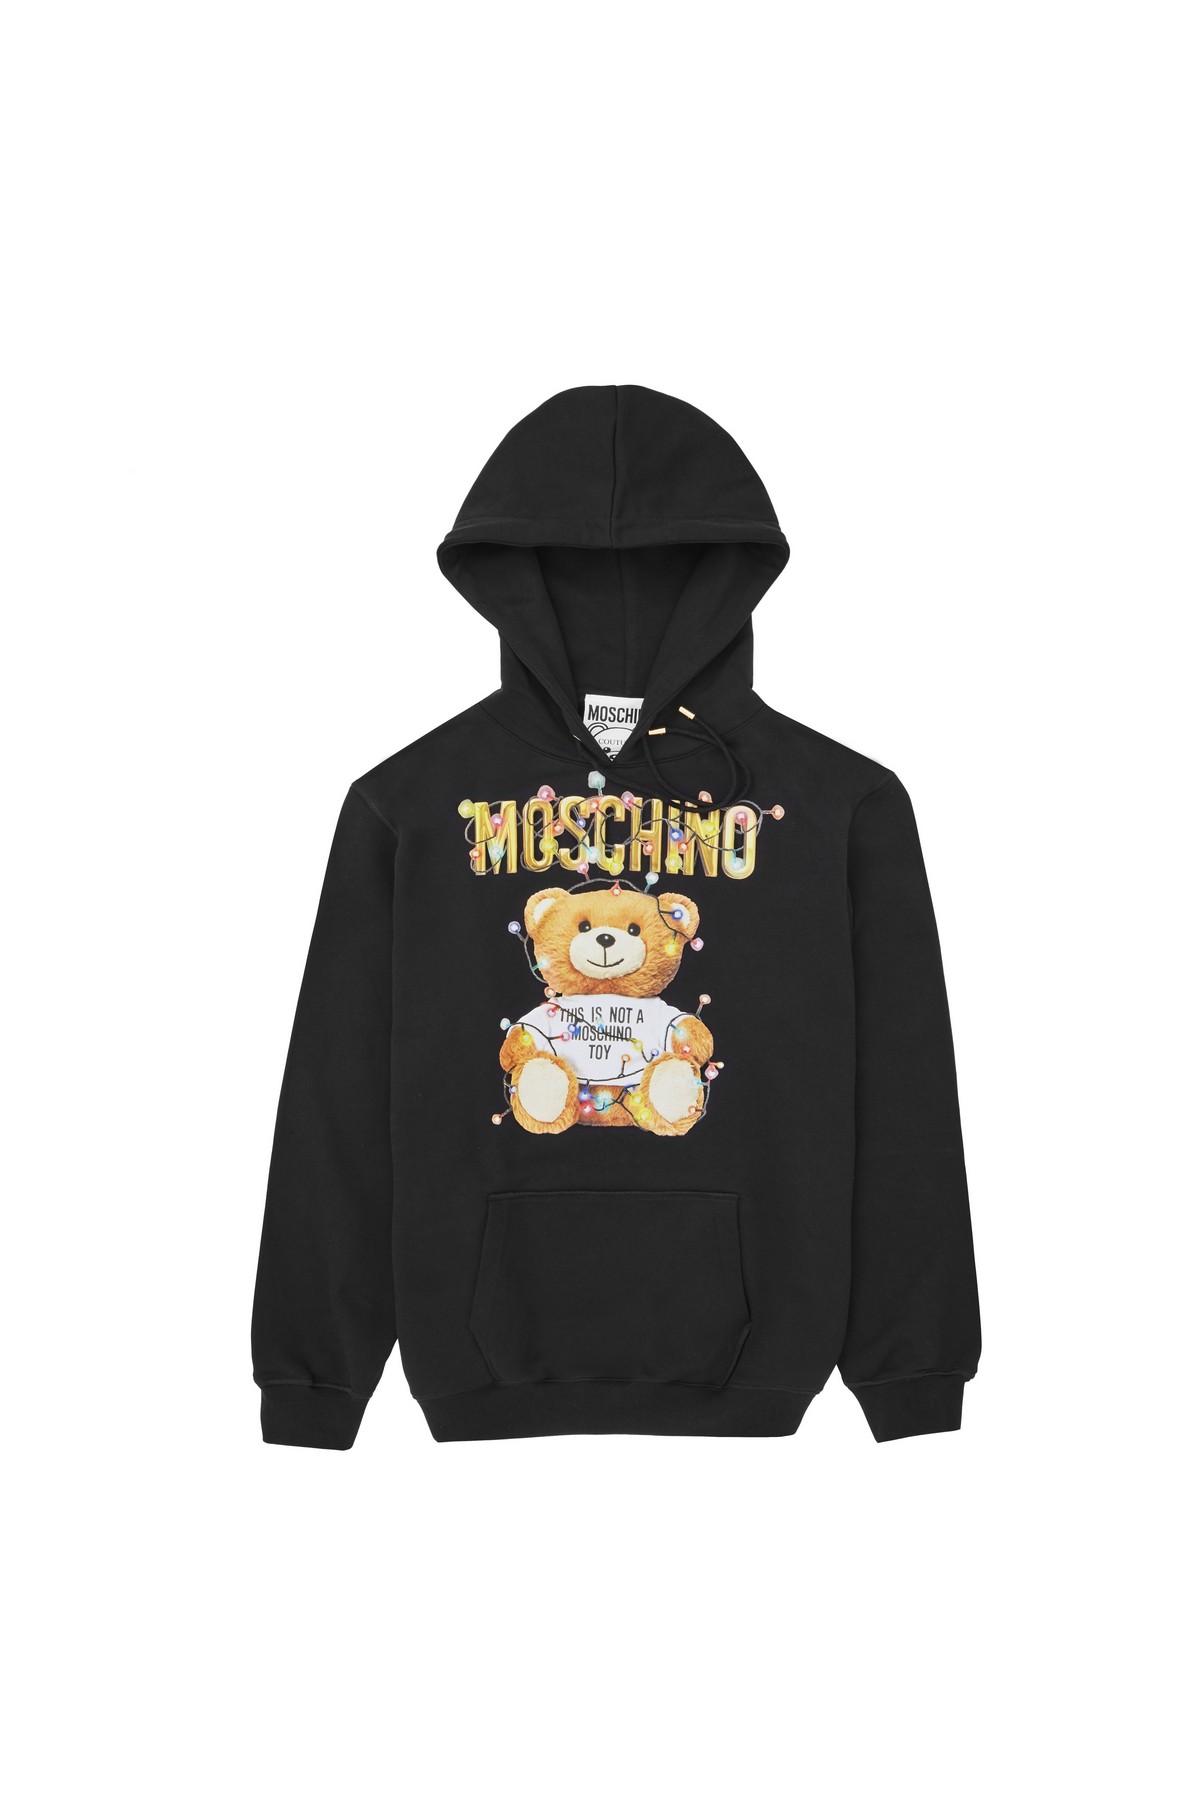 Moschino regali Natale 2018